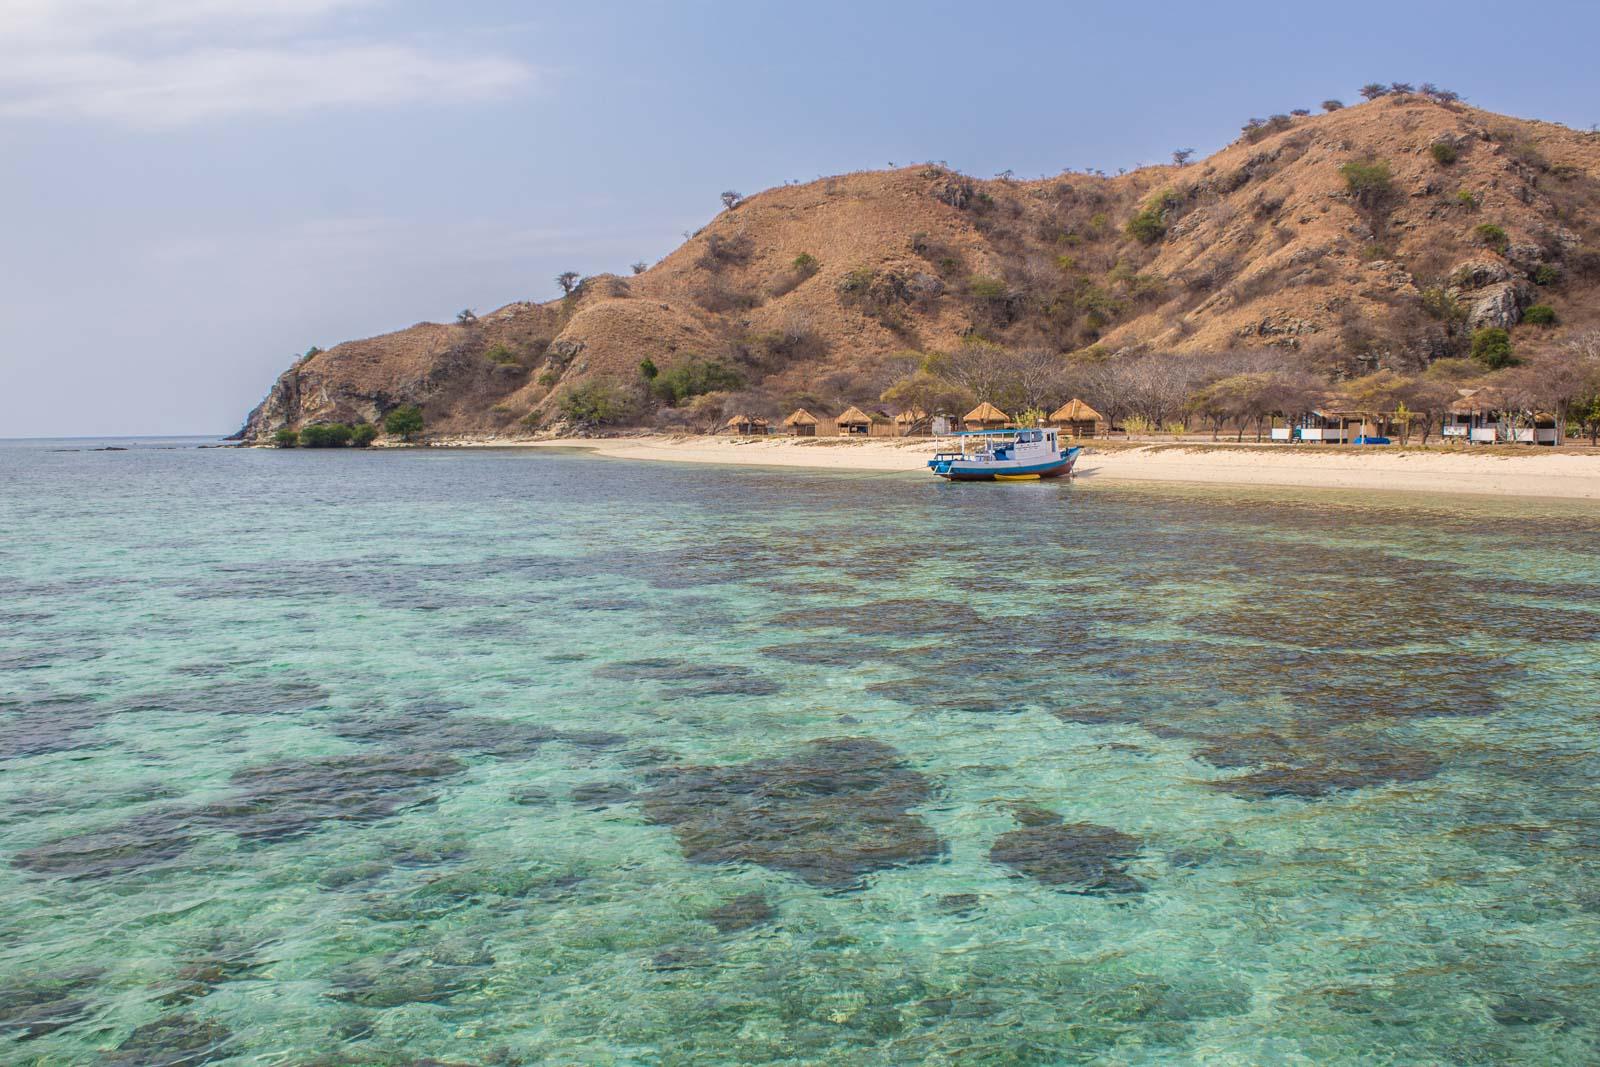 Pink Beach, Kanawa Beach, Komodo National Park, Indonesia